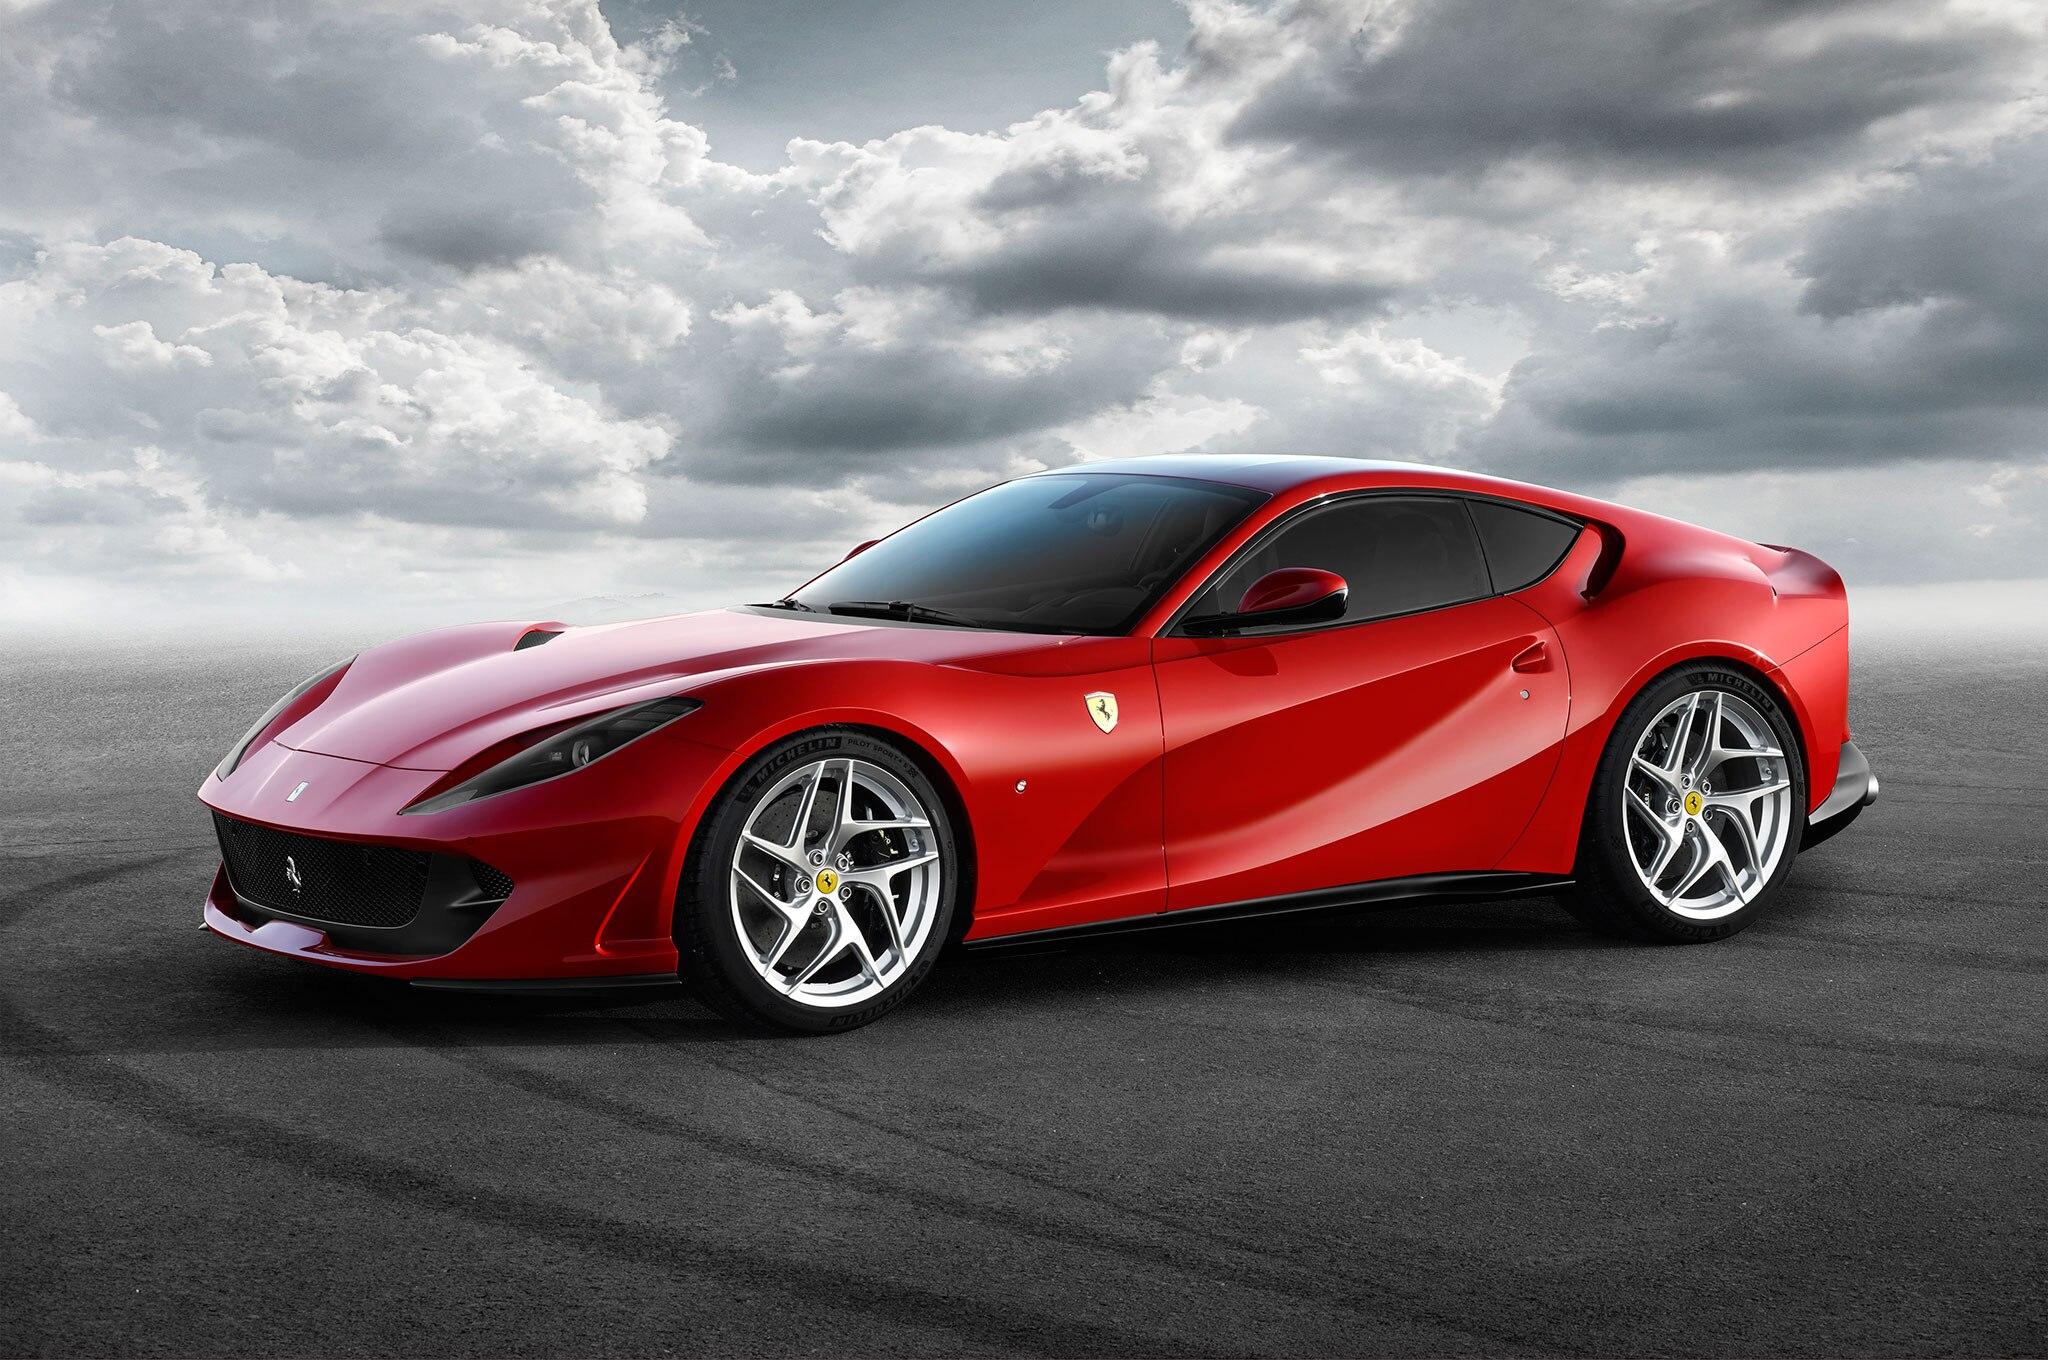 Ferrari 812 Superfast 06